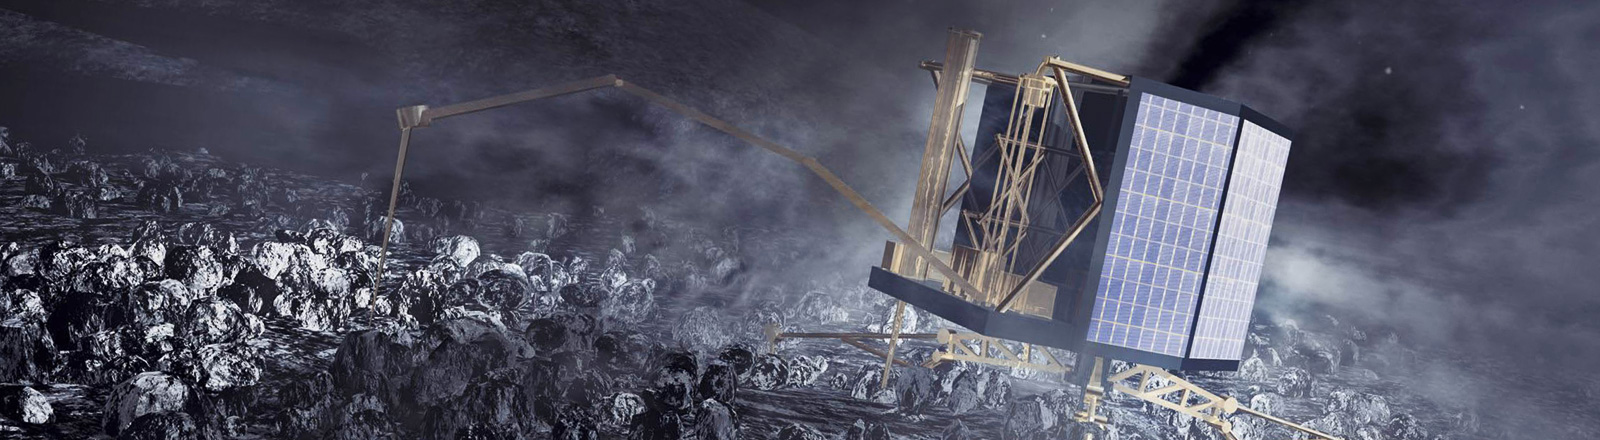 Illustration des Landeroboters Philae auf dem Kometen Tschuri; Bild: dpa